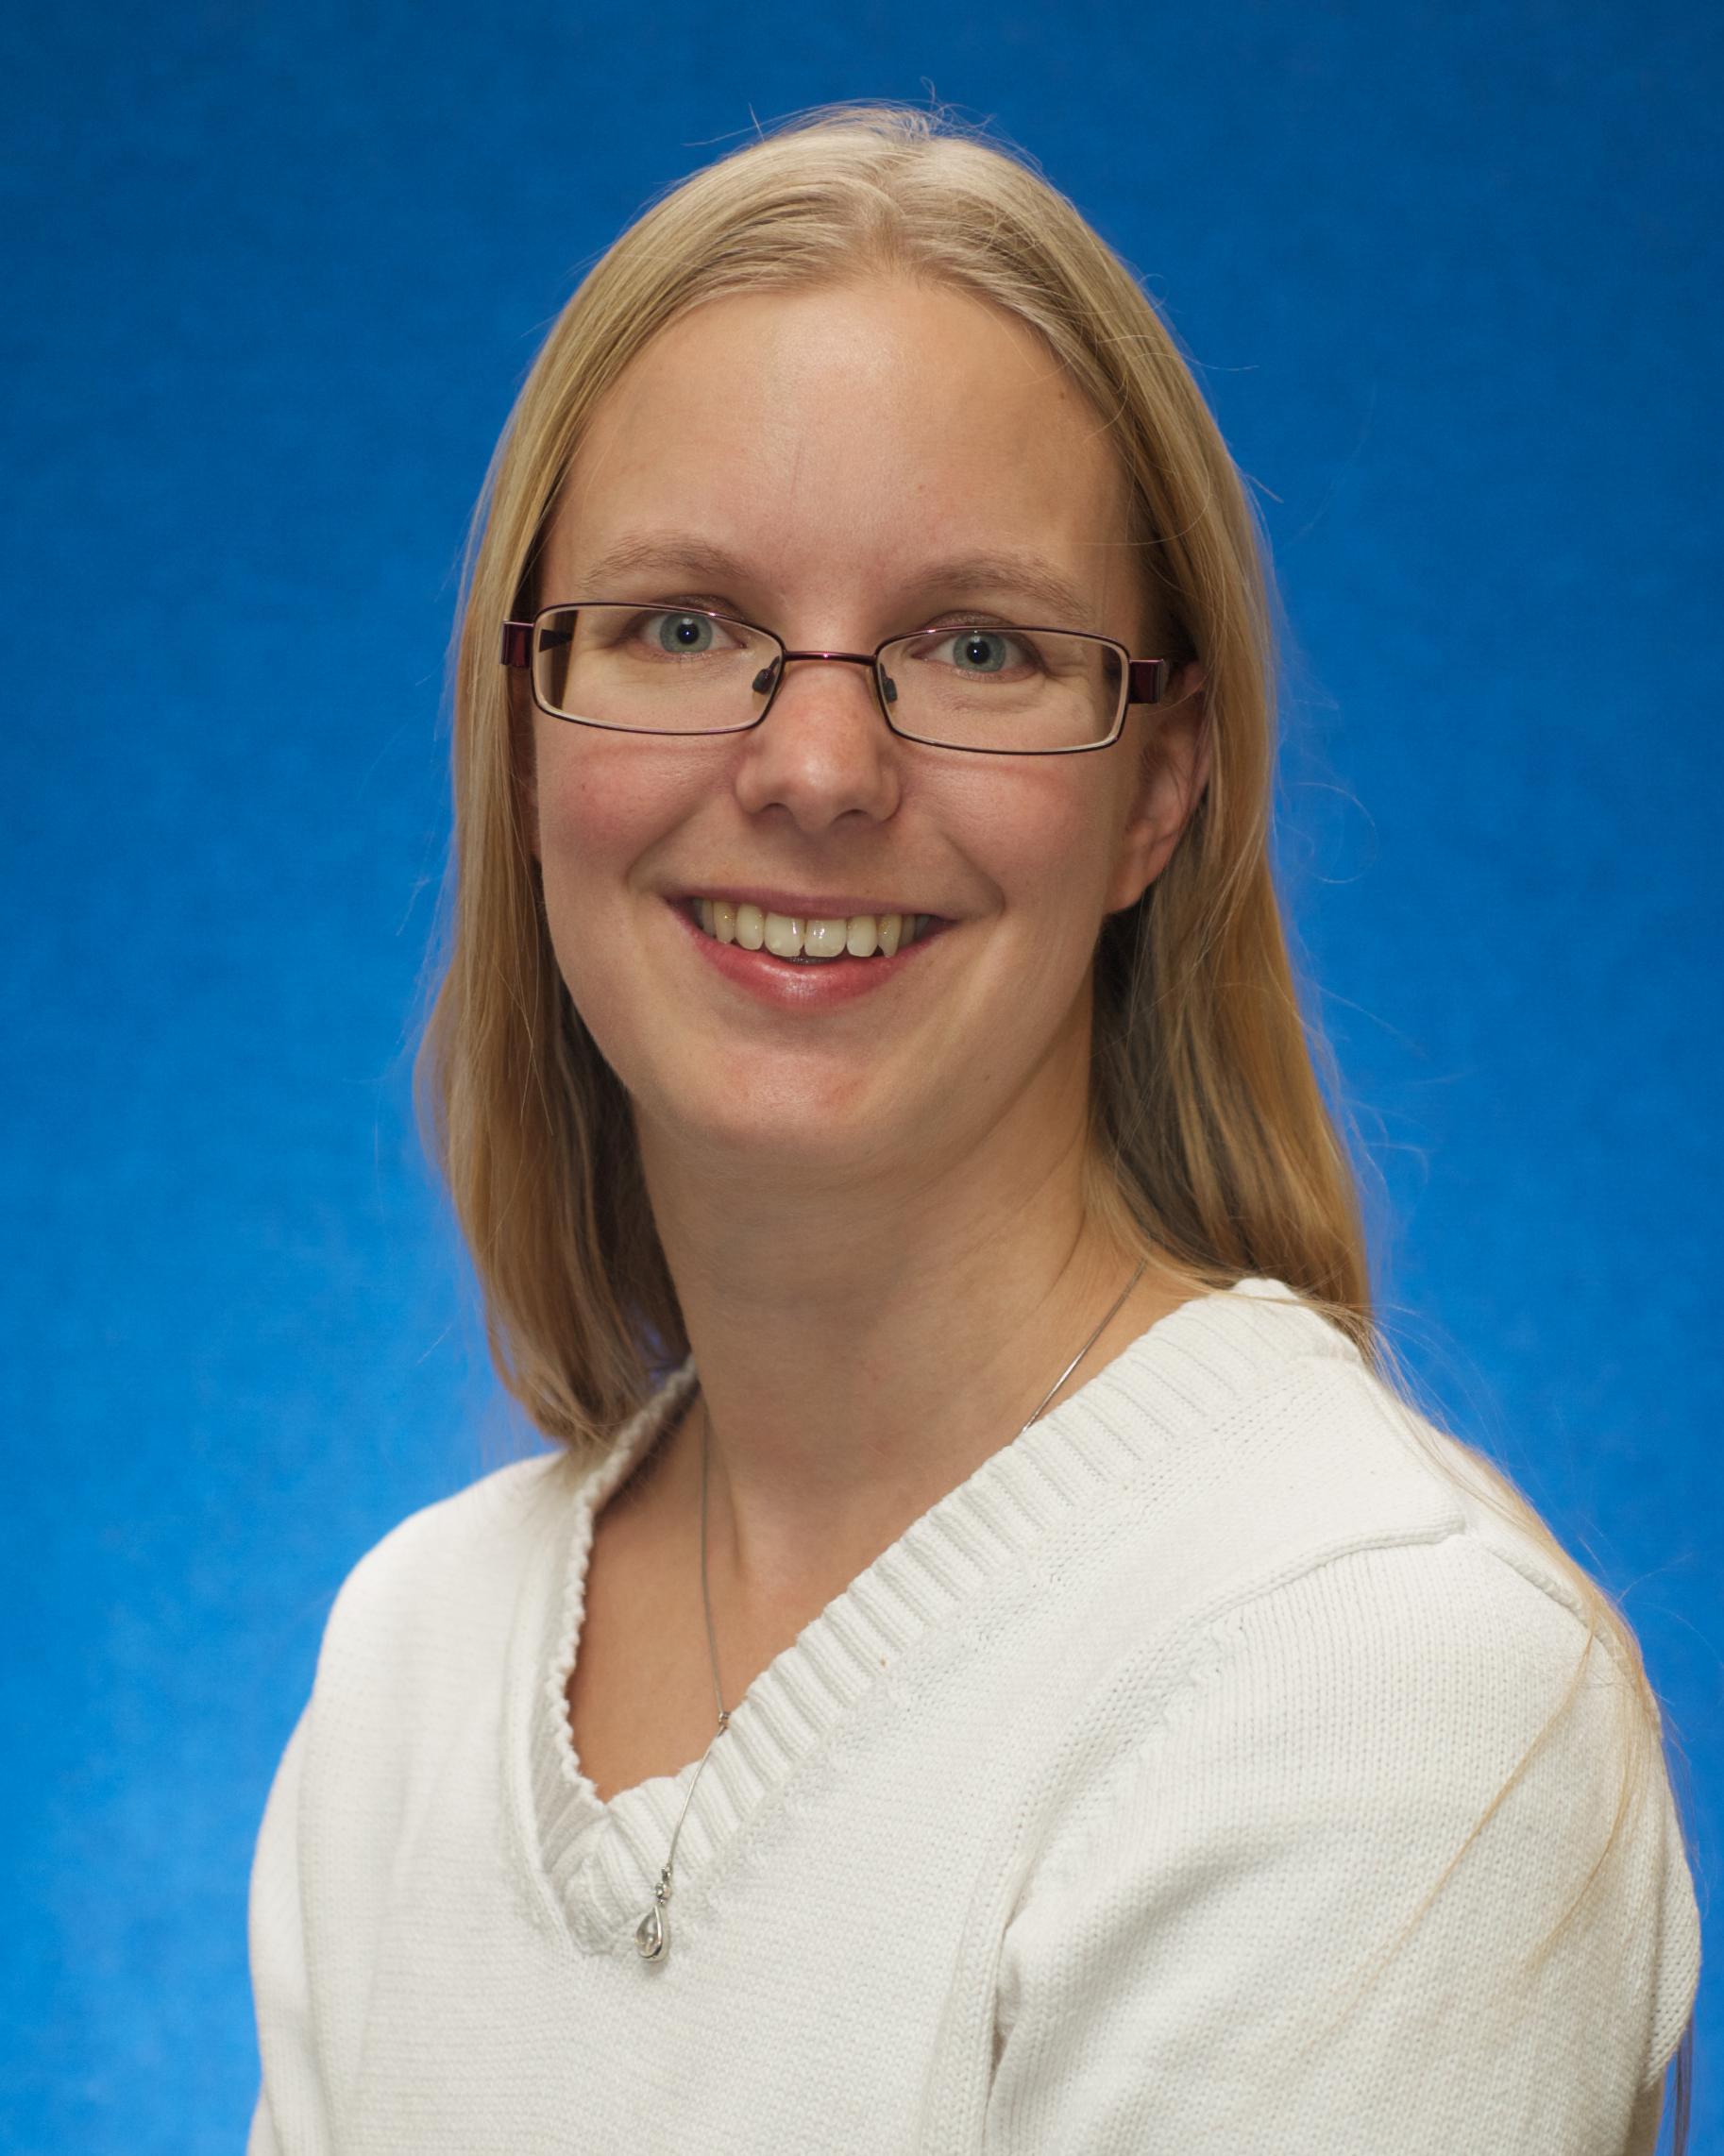 Lara Warmelink